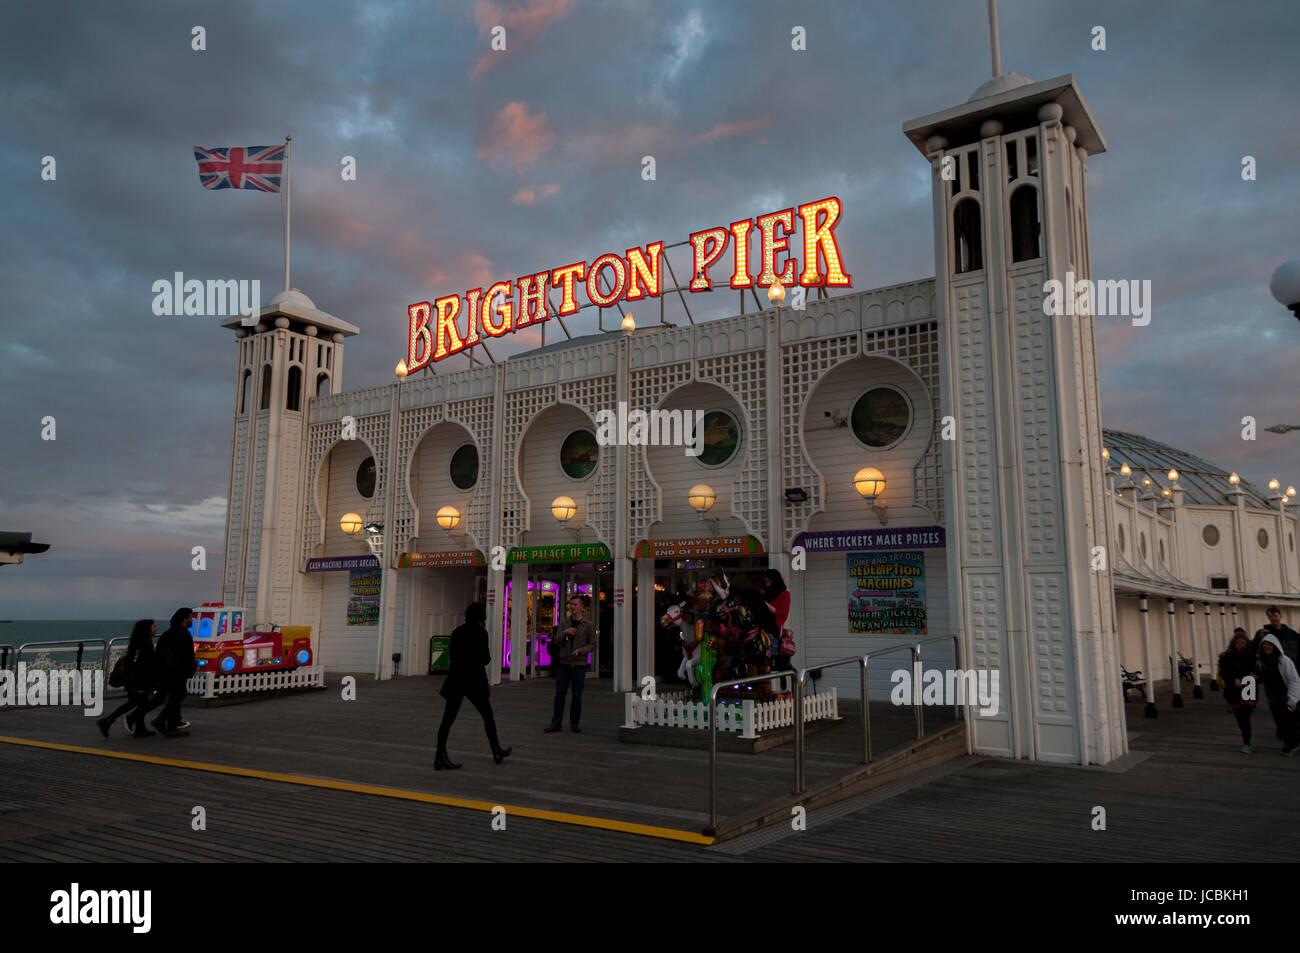 Brighton Pier, United Kingdom - Stock Image